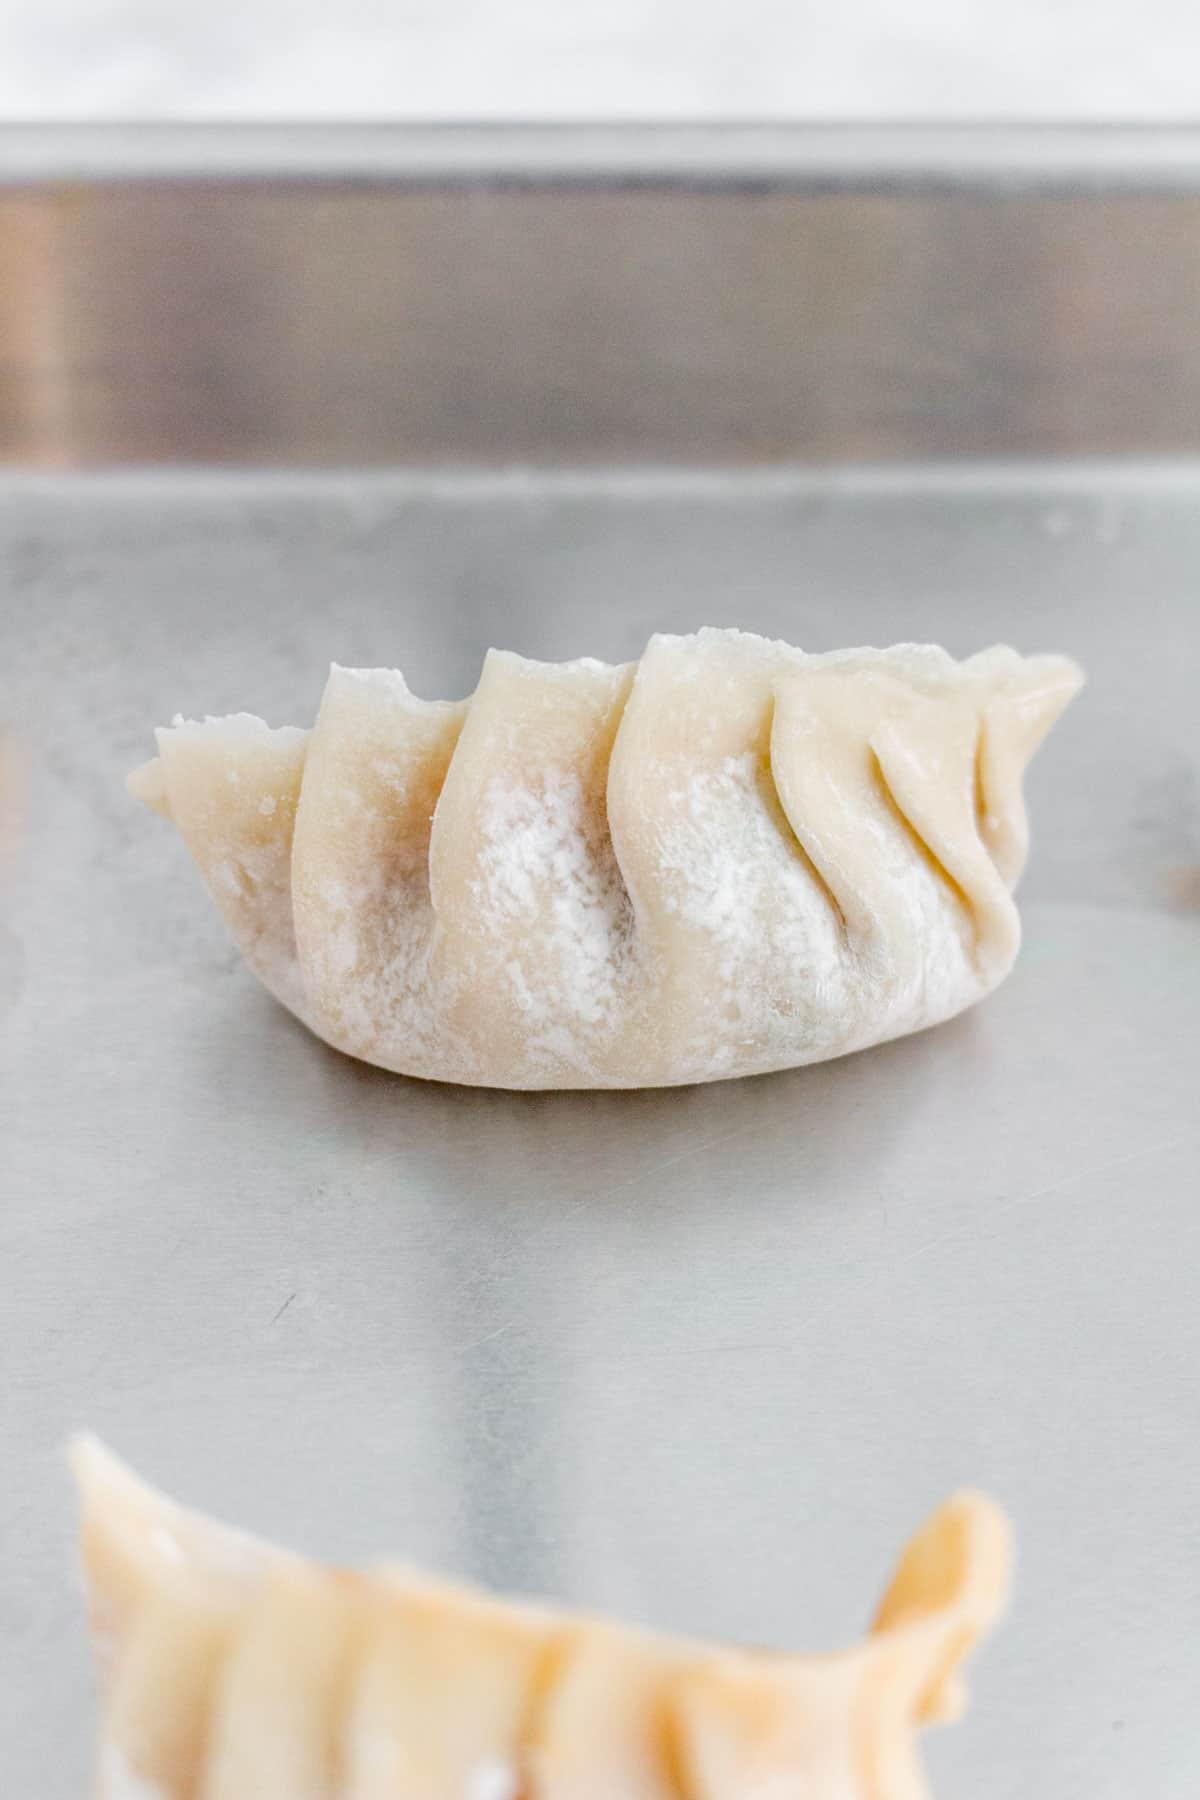 Close up of a raw pork dumplings.